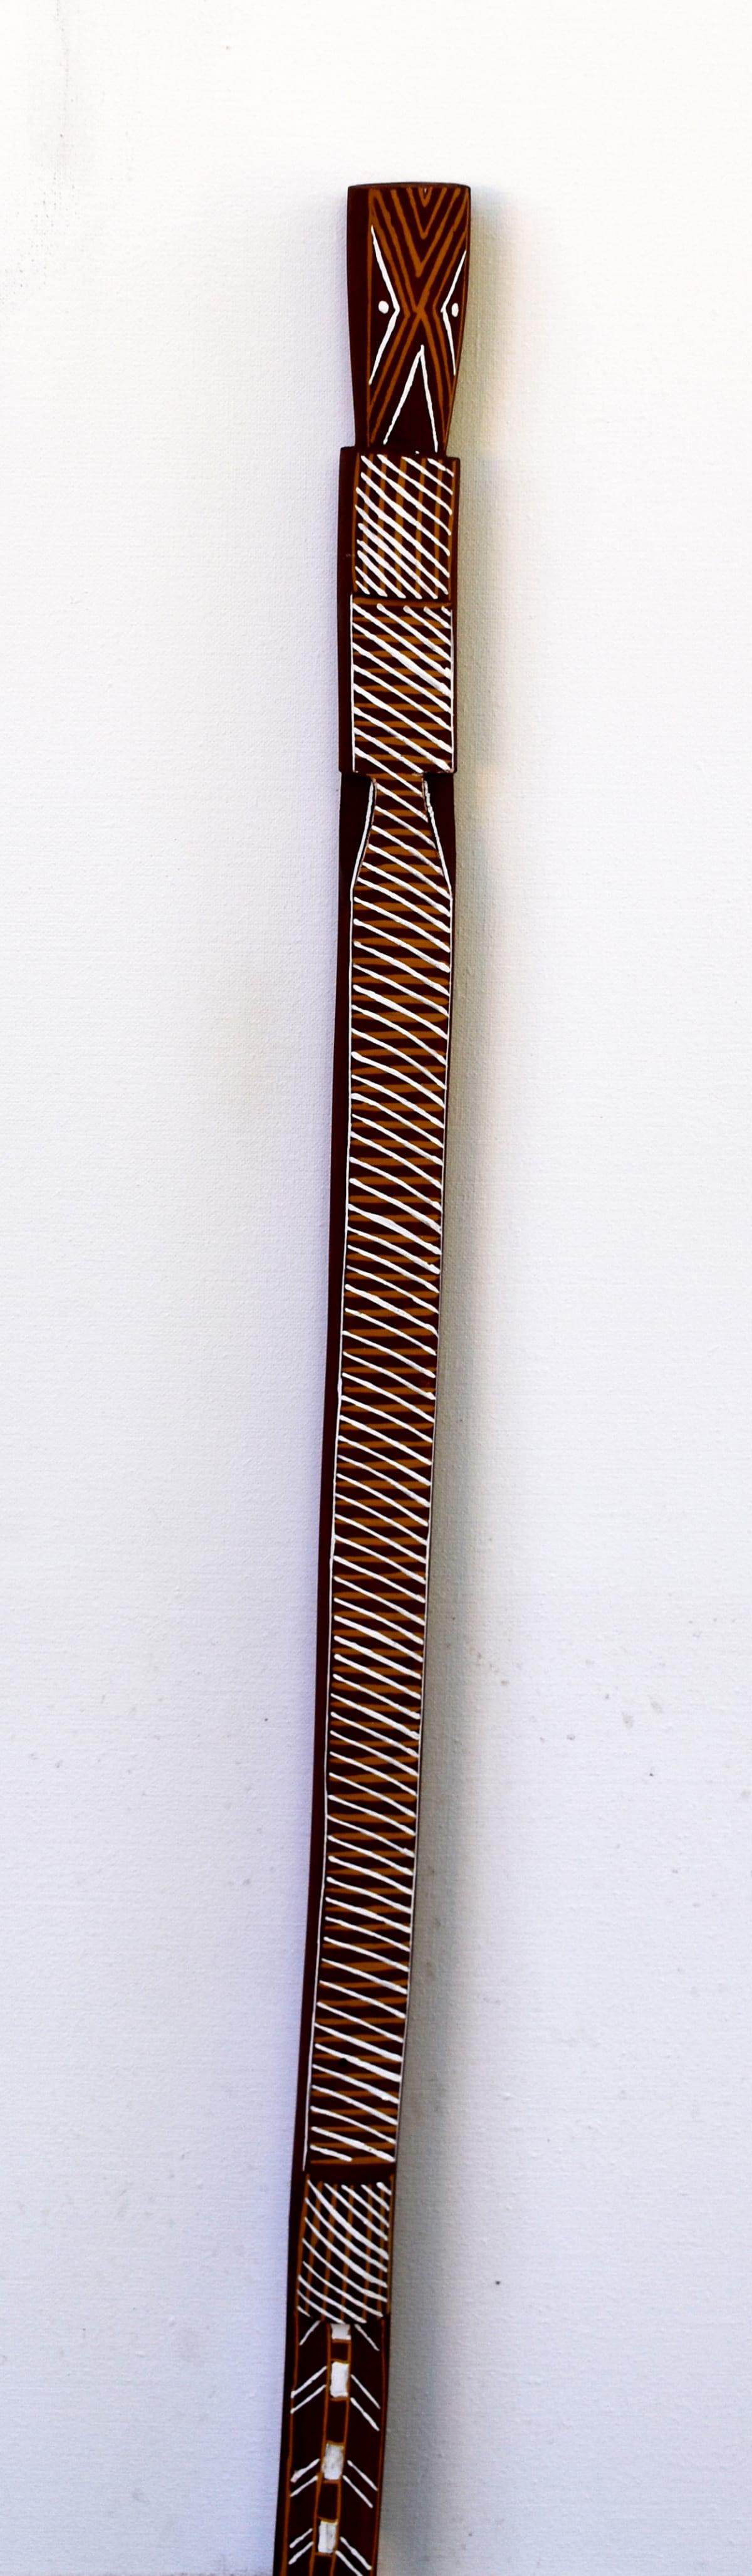 Joy Garlbin Djomi, 2018 Carved Wood & Ochre 94 x 4 x 4 cm